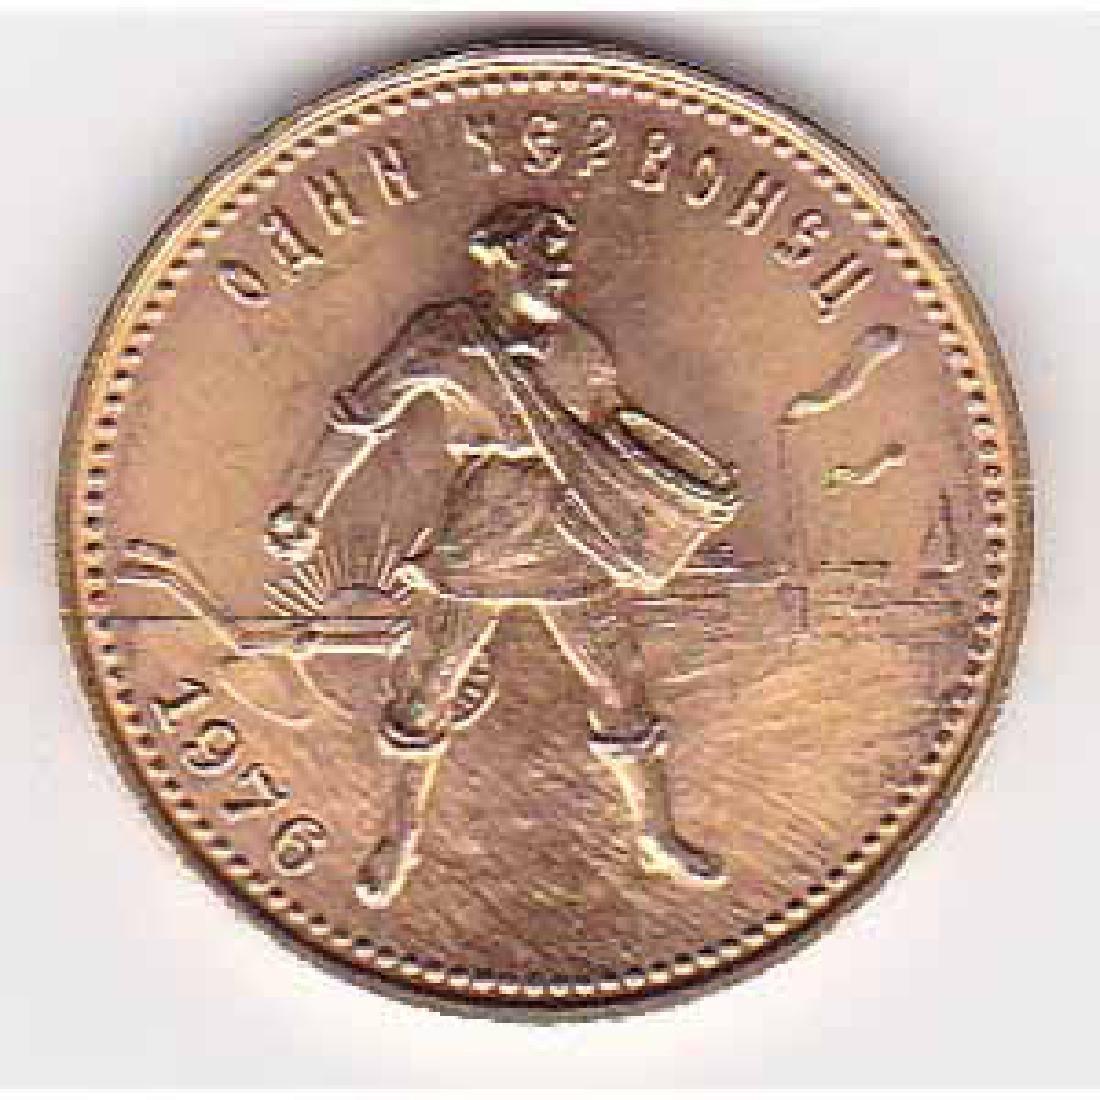 Russia 1 chervonets gold 1975-1982